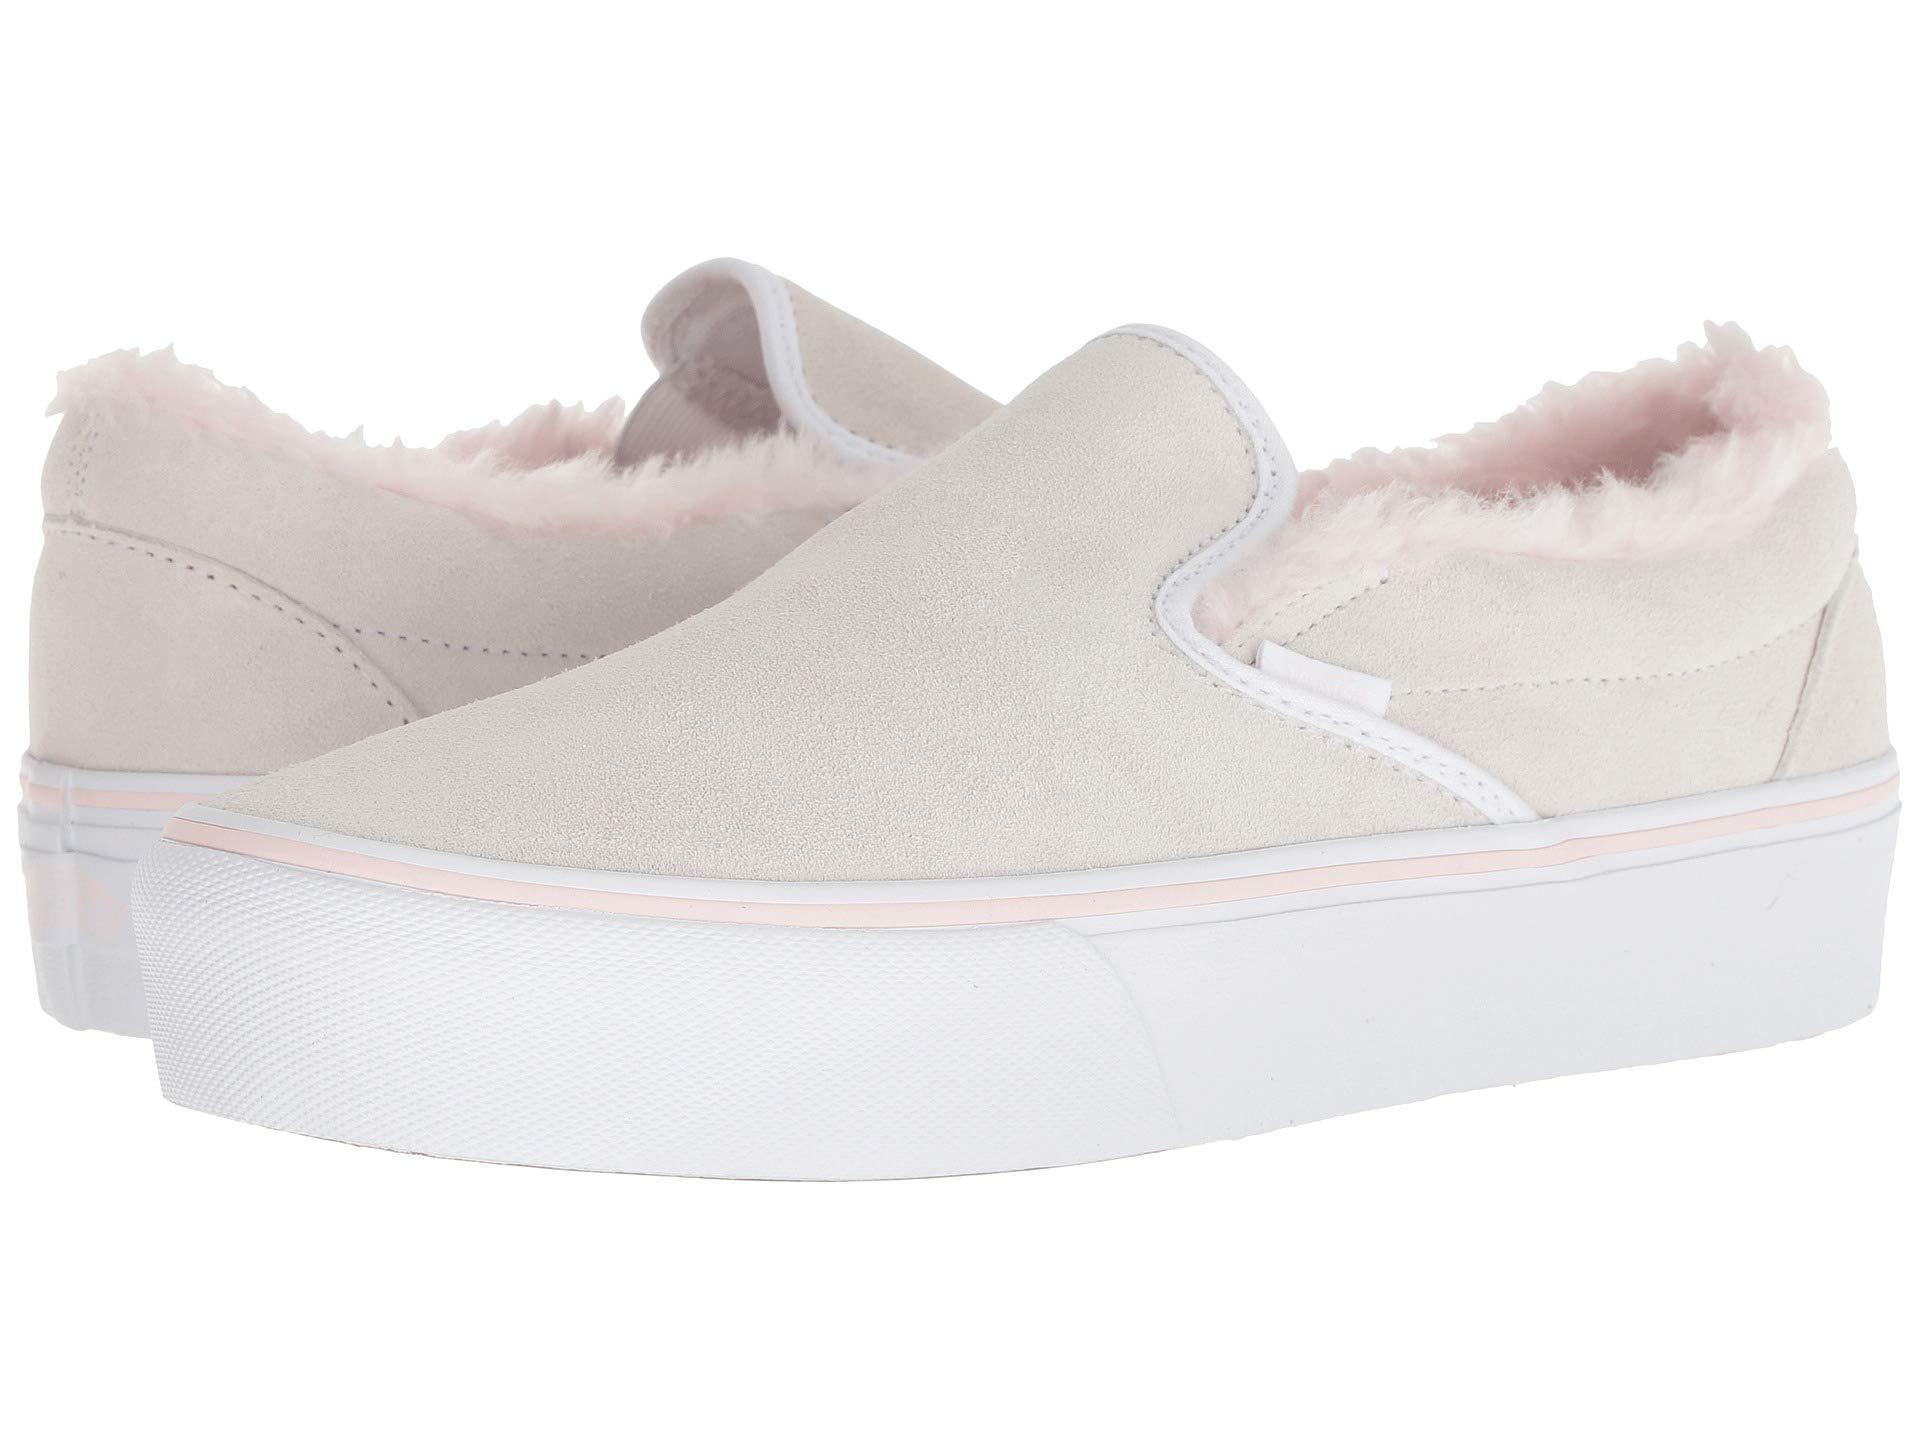 e1813e9160166e Lyst - Vans Women Classic Slip-on Platform Suede Sneakers